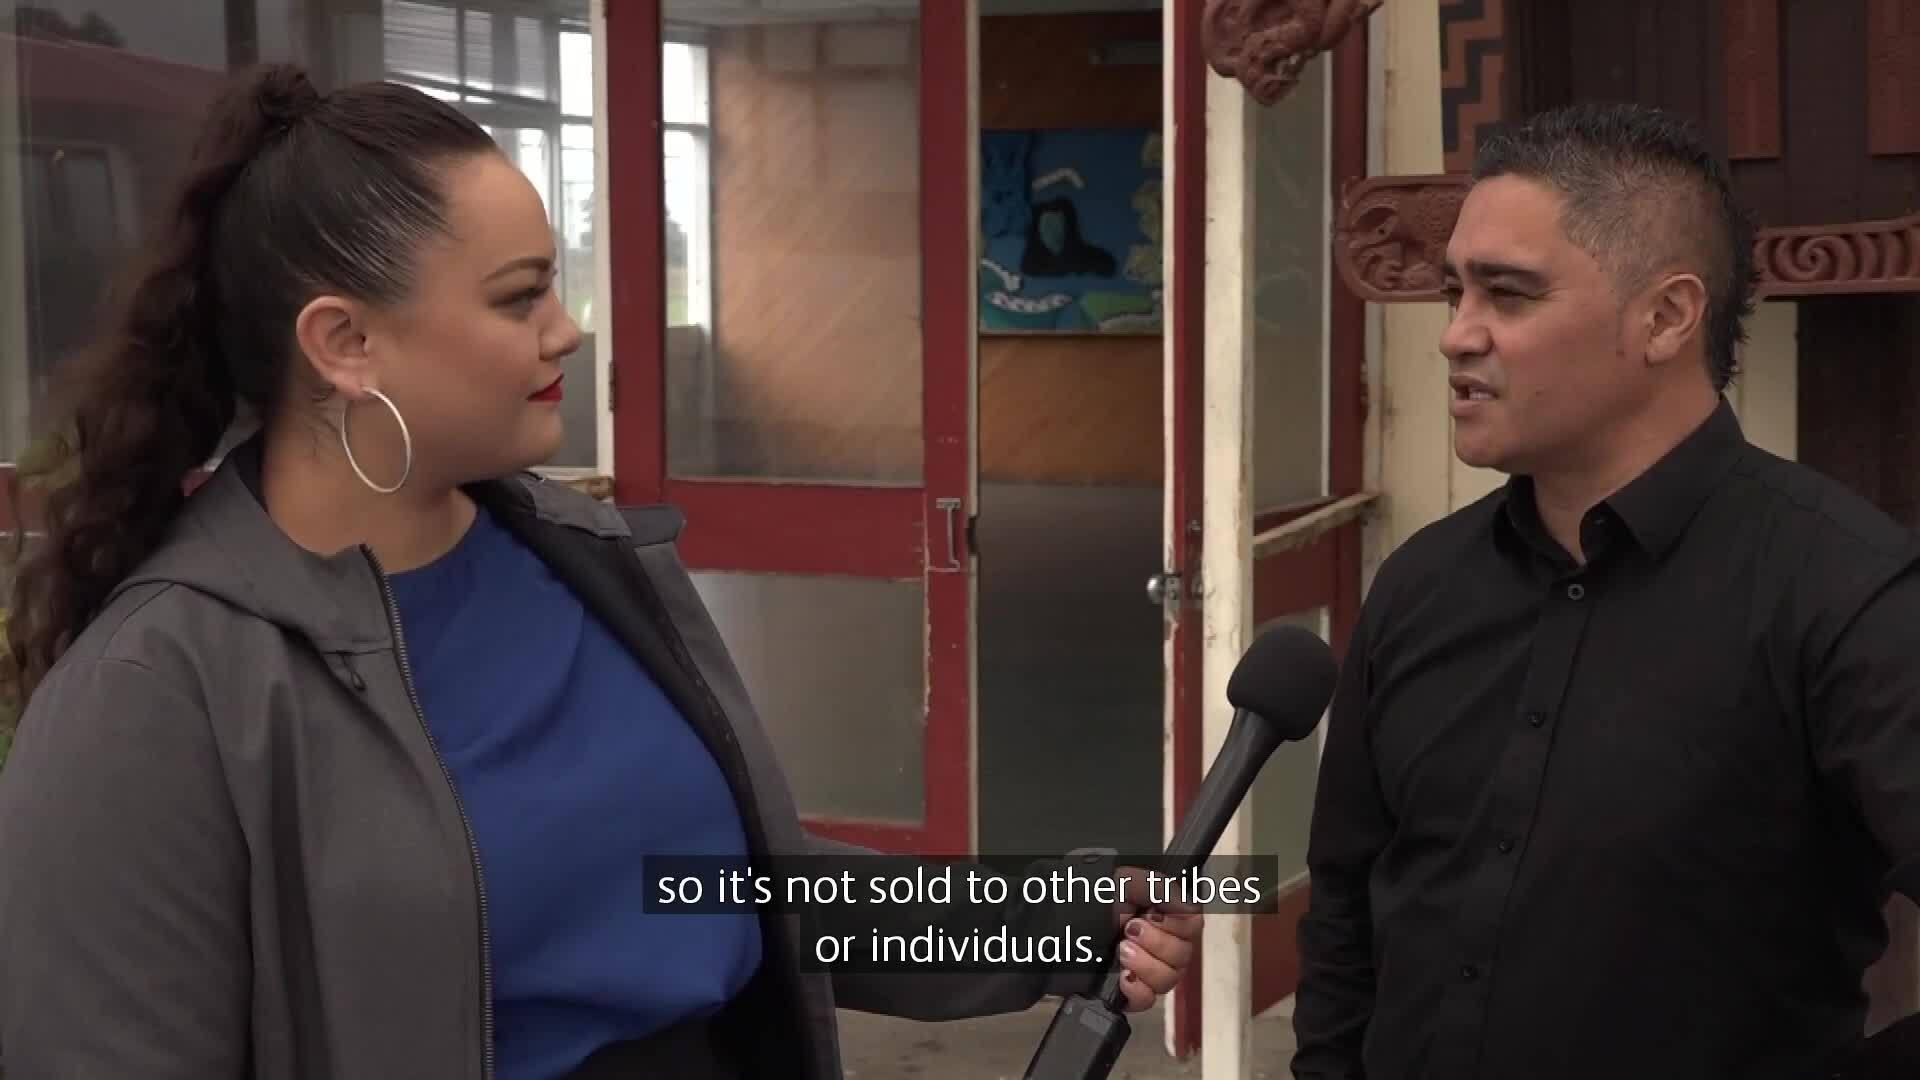 Video for Kawekōrero, Series 3 Episode 20